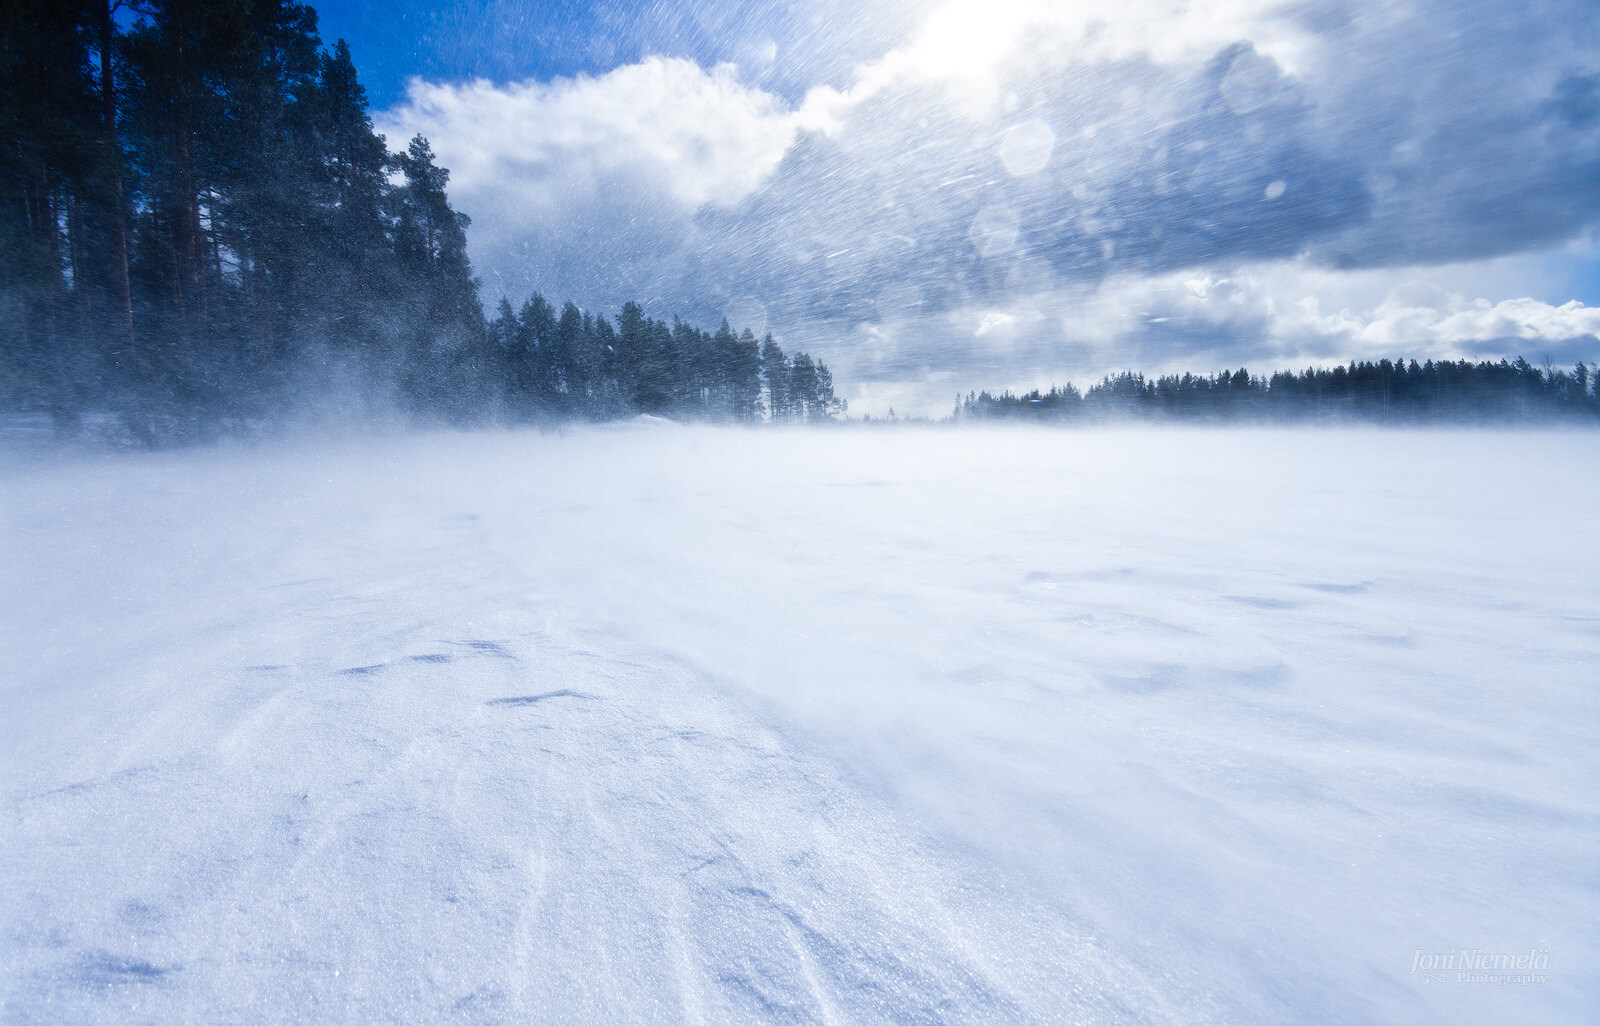 Погода в Казахстане: прогноз на 26-27 сентября